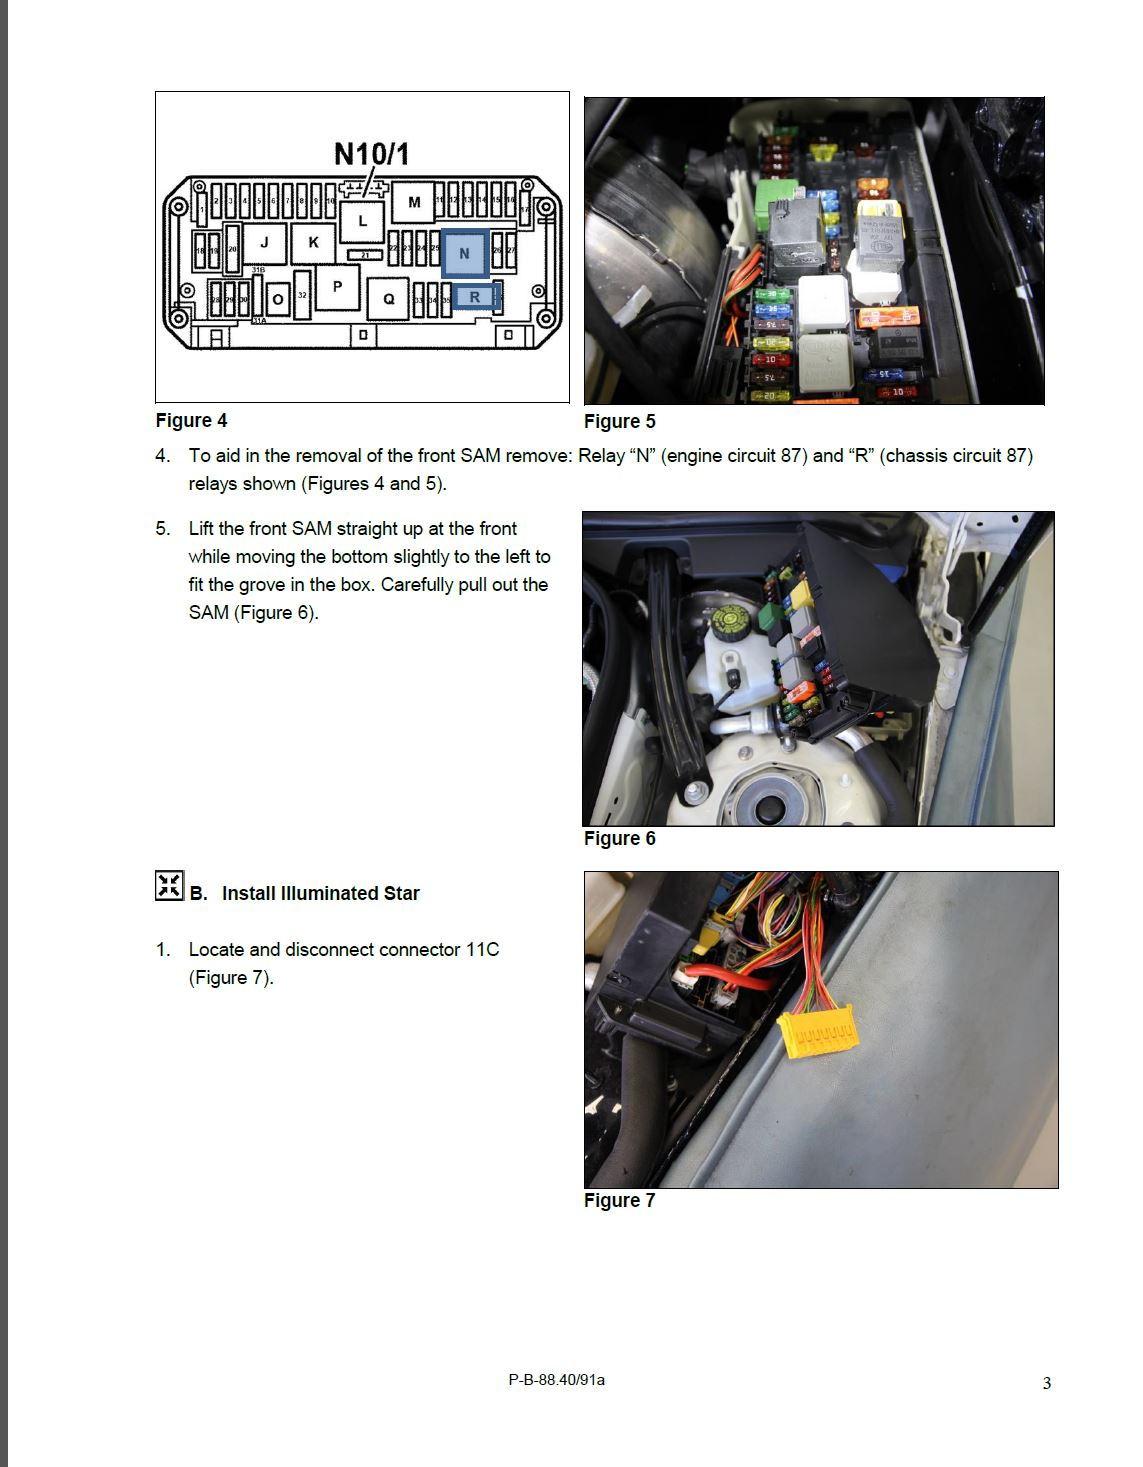 Mercedes benz illuminated star installation instructions